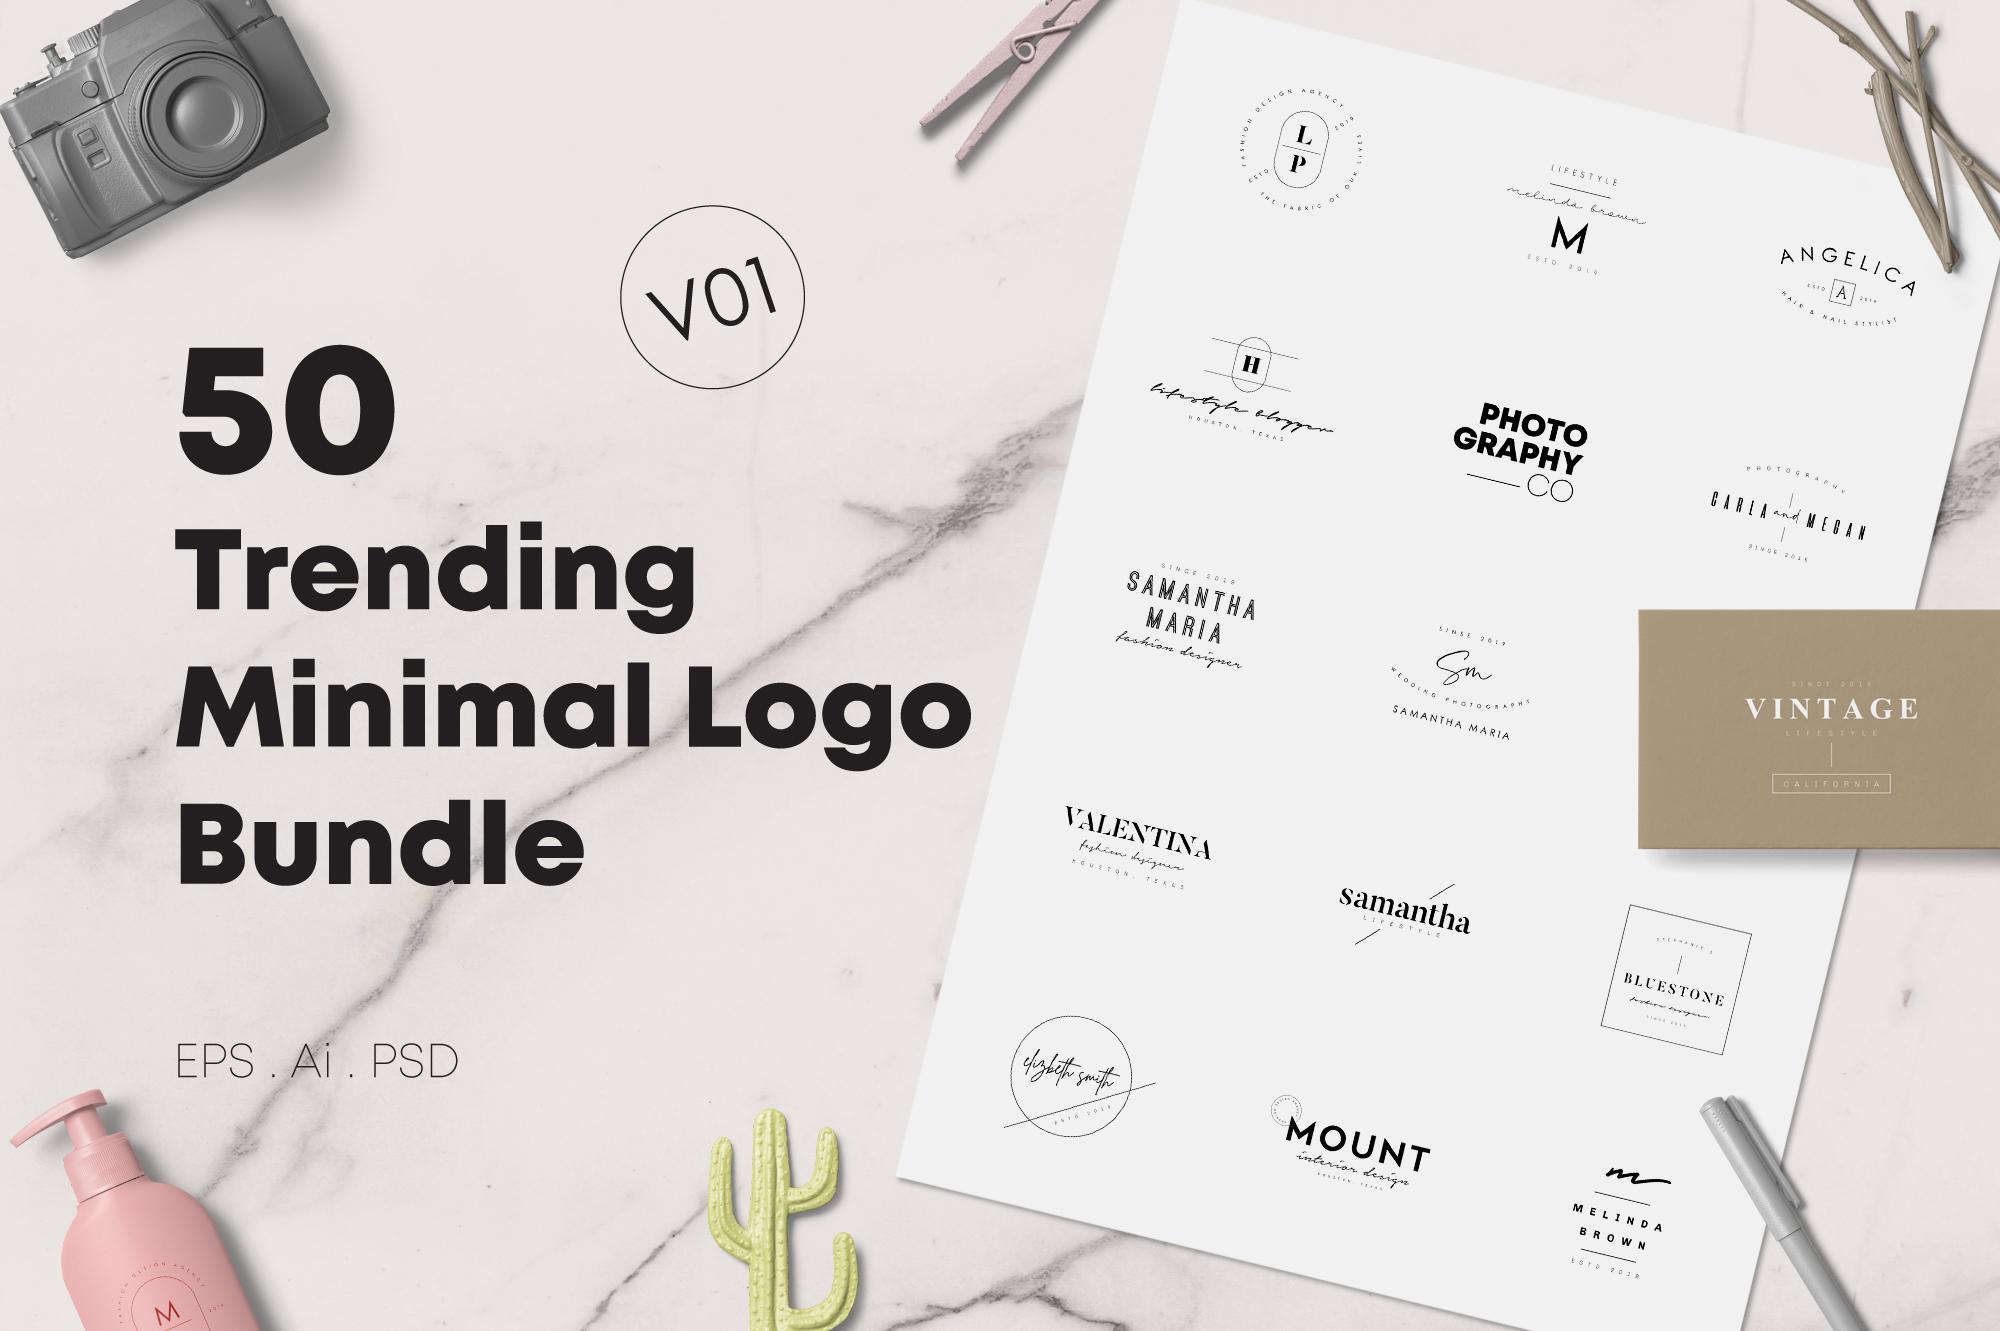 50 Trending Minimal Logo Bundle V01 example image 1